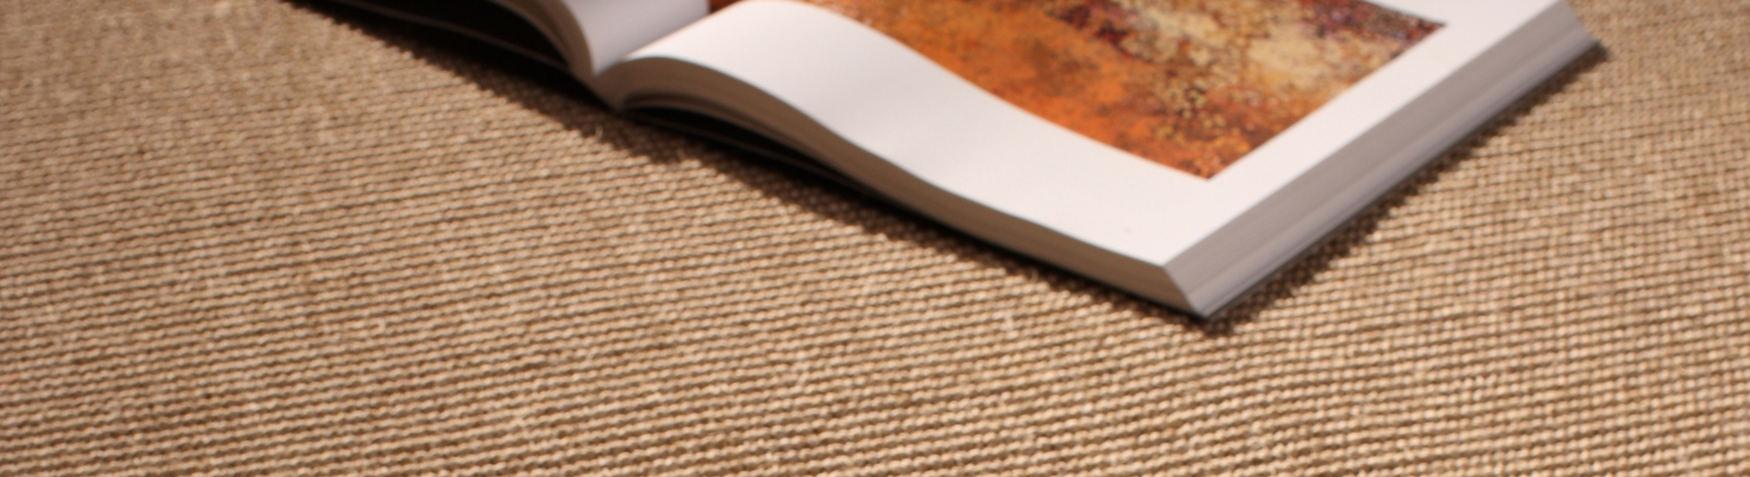 Natural Fibre Carpet London